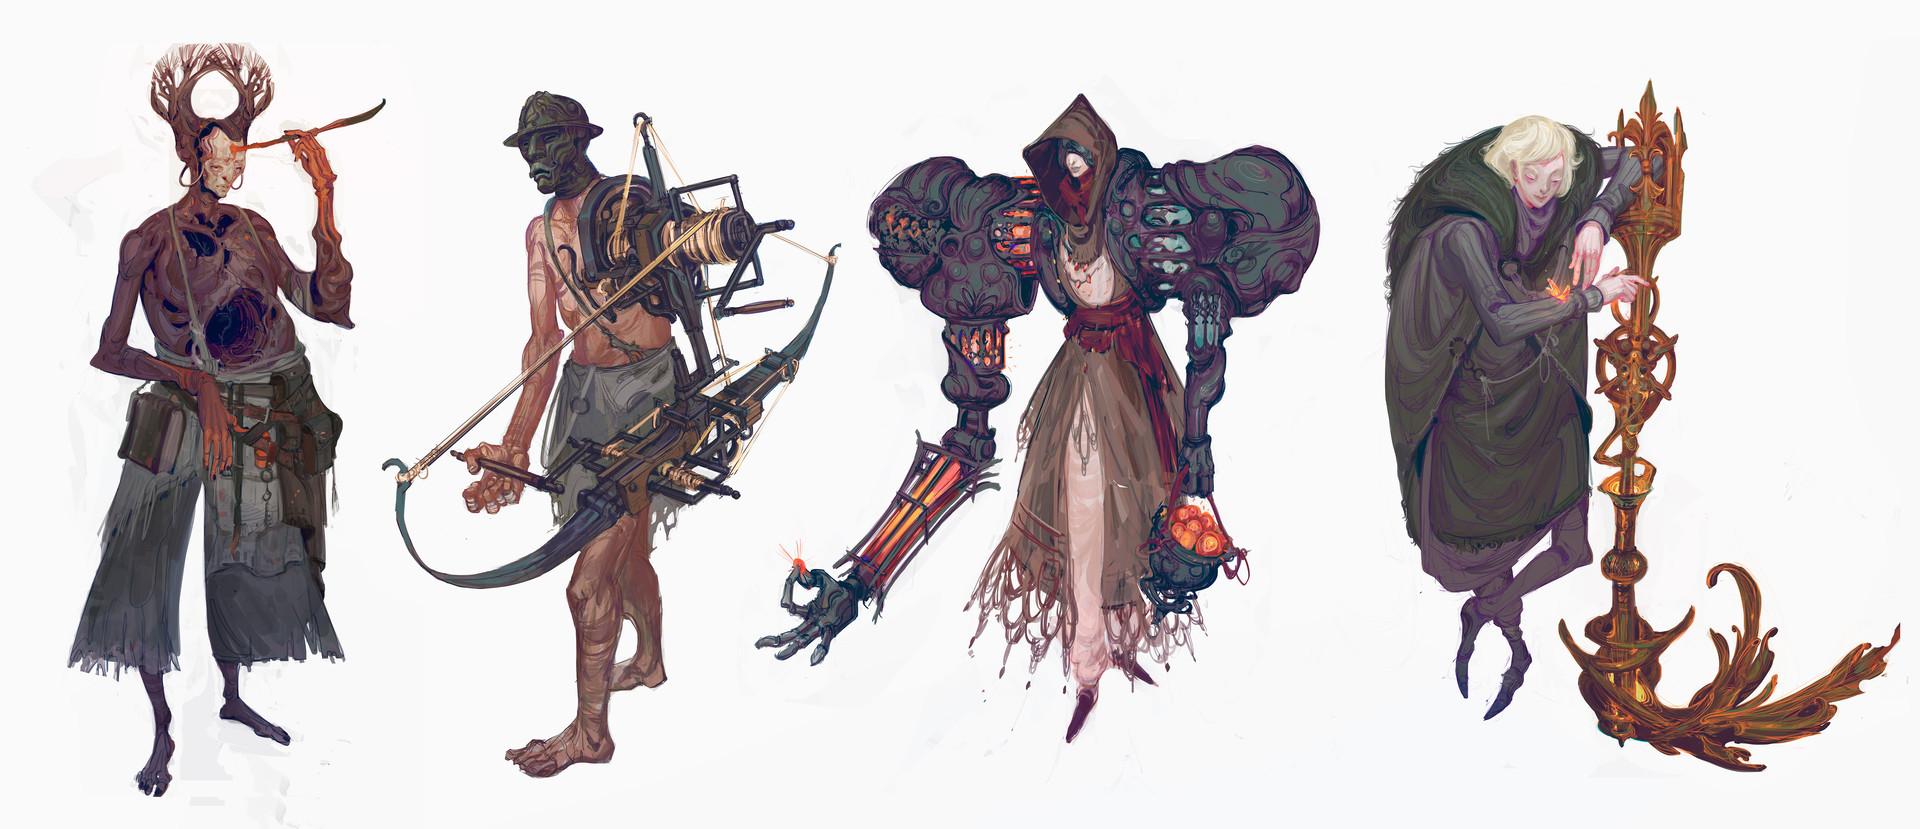 Joao bragato characterdesignbk